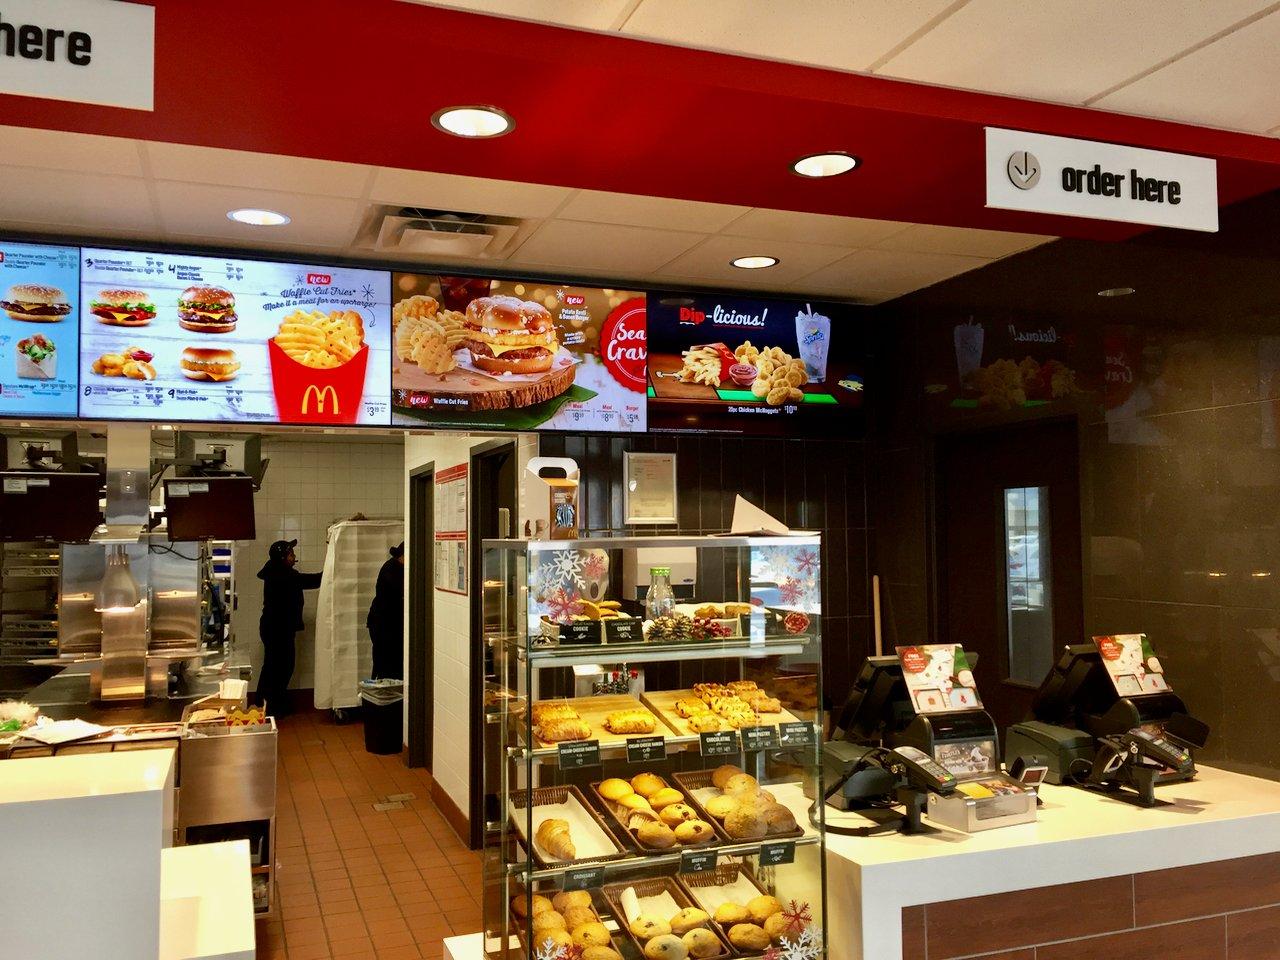 Crazy Idea of the Week: McDonalds Should Be 3D Printing